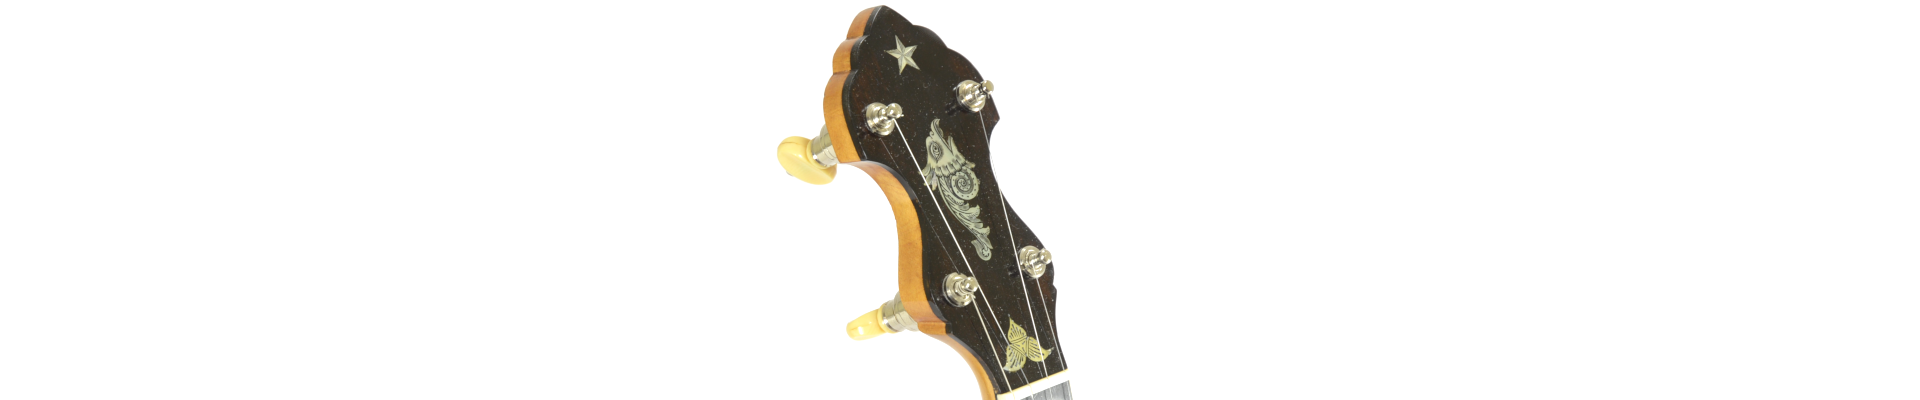 Gryphon Style Banjo Headstock Inlay